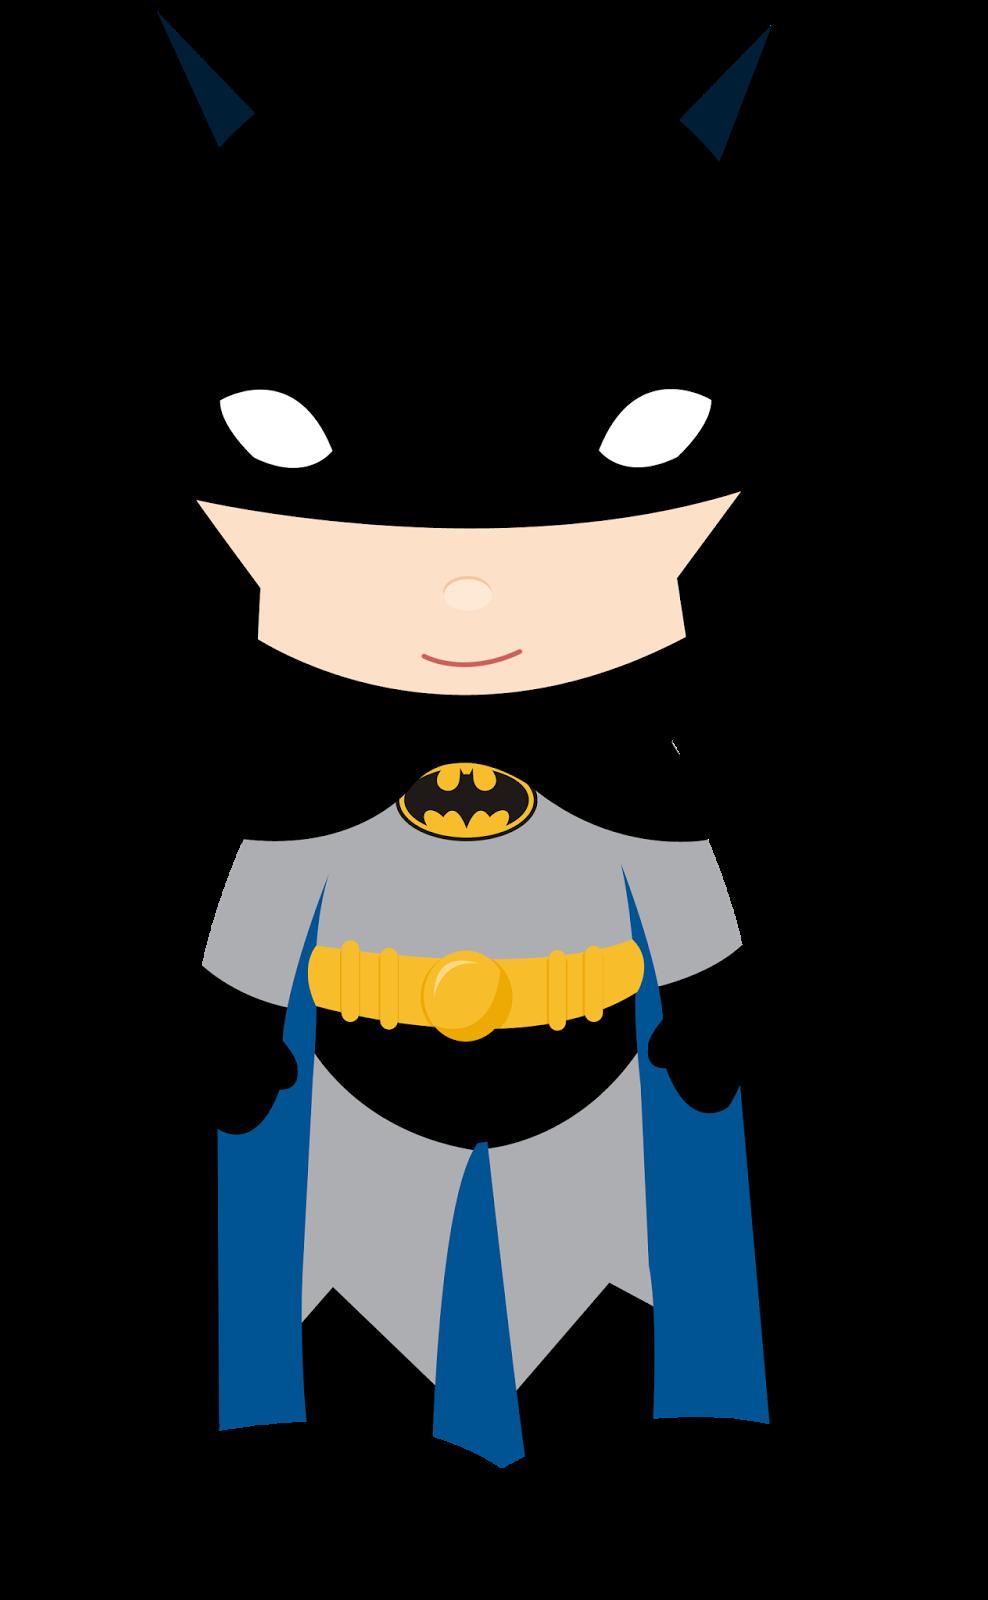 Populares Related image   Flores   Pinterest   Retrospectiva, Batman e Super  OT52